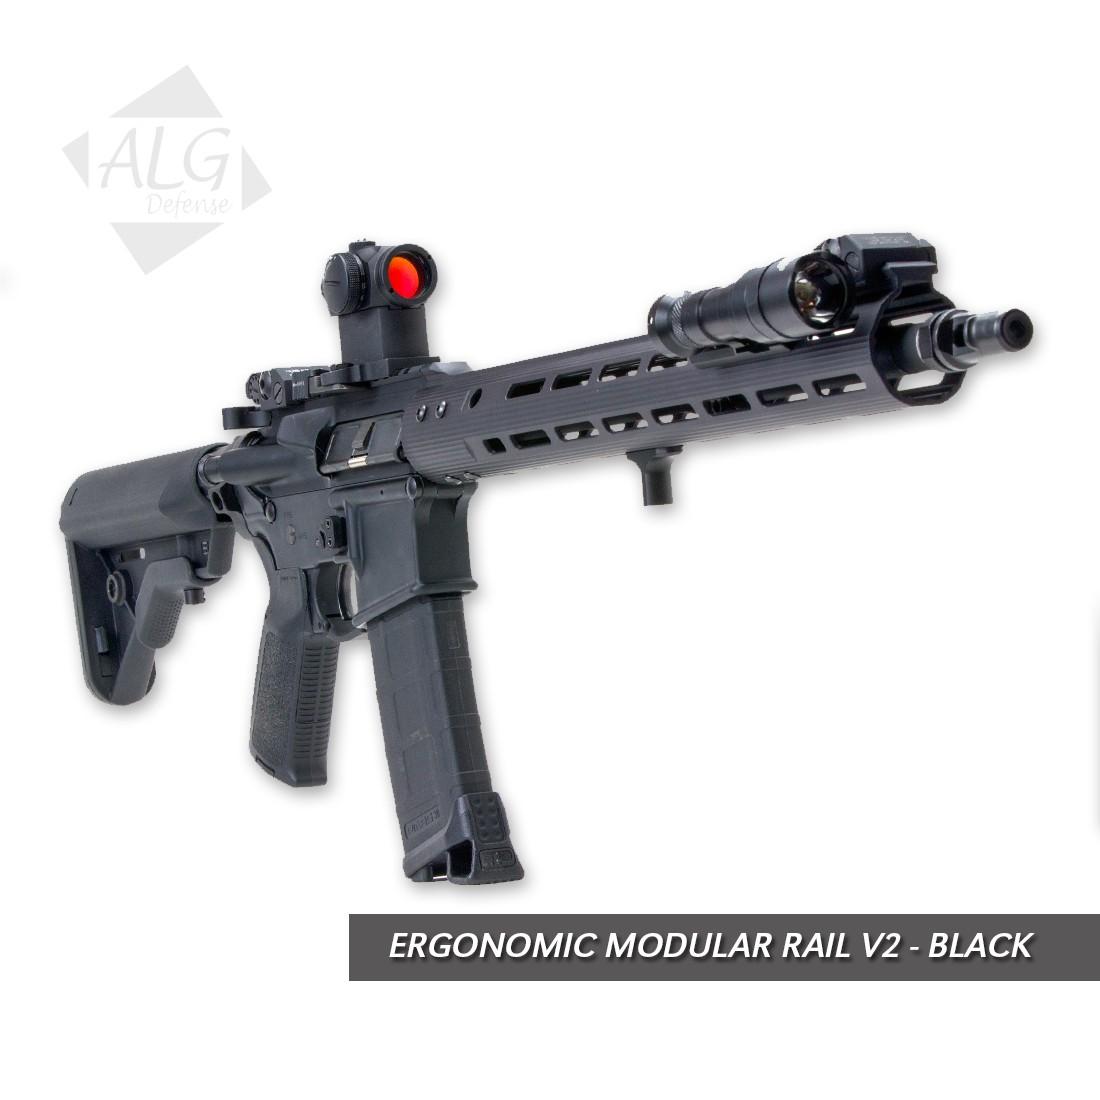 Security Equipment Gun Shop